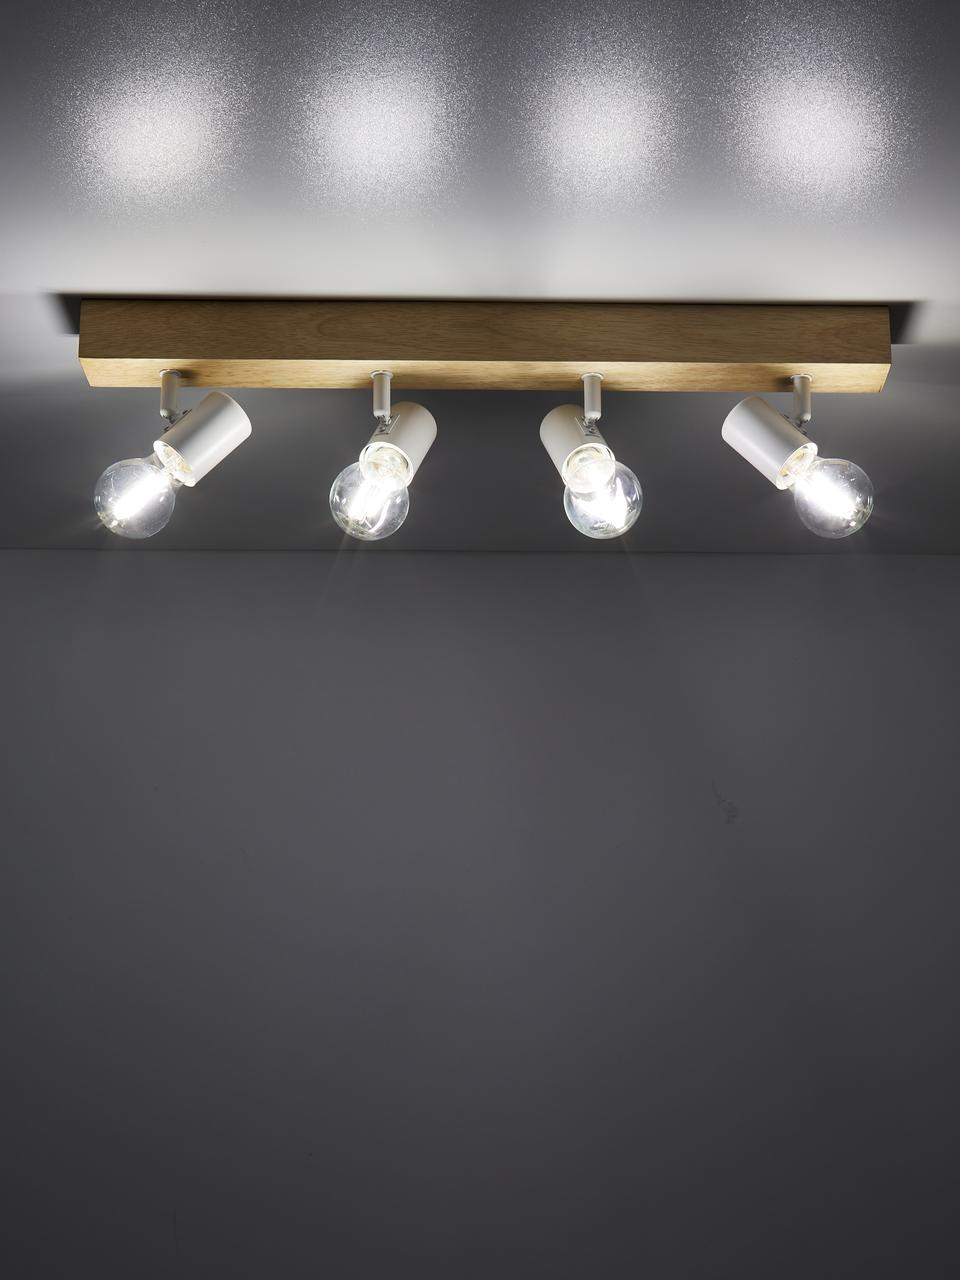 Deckenstrahler Townshend aus Holz, Baldachin: Holz, Weiß, Holz, 63 x 13 cm